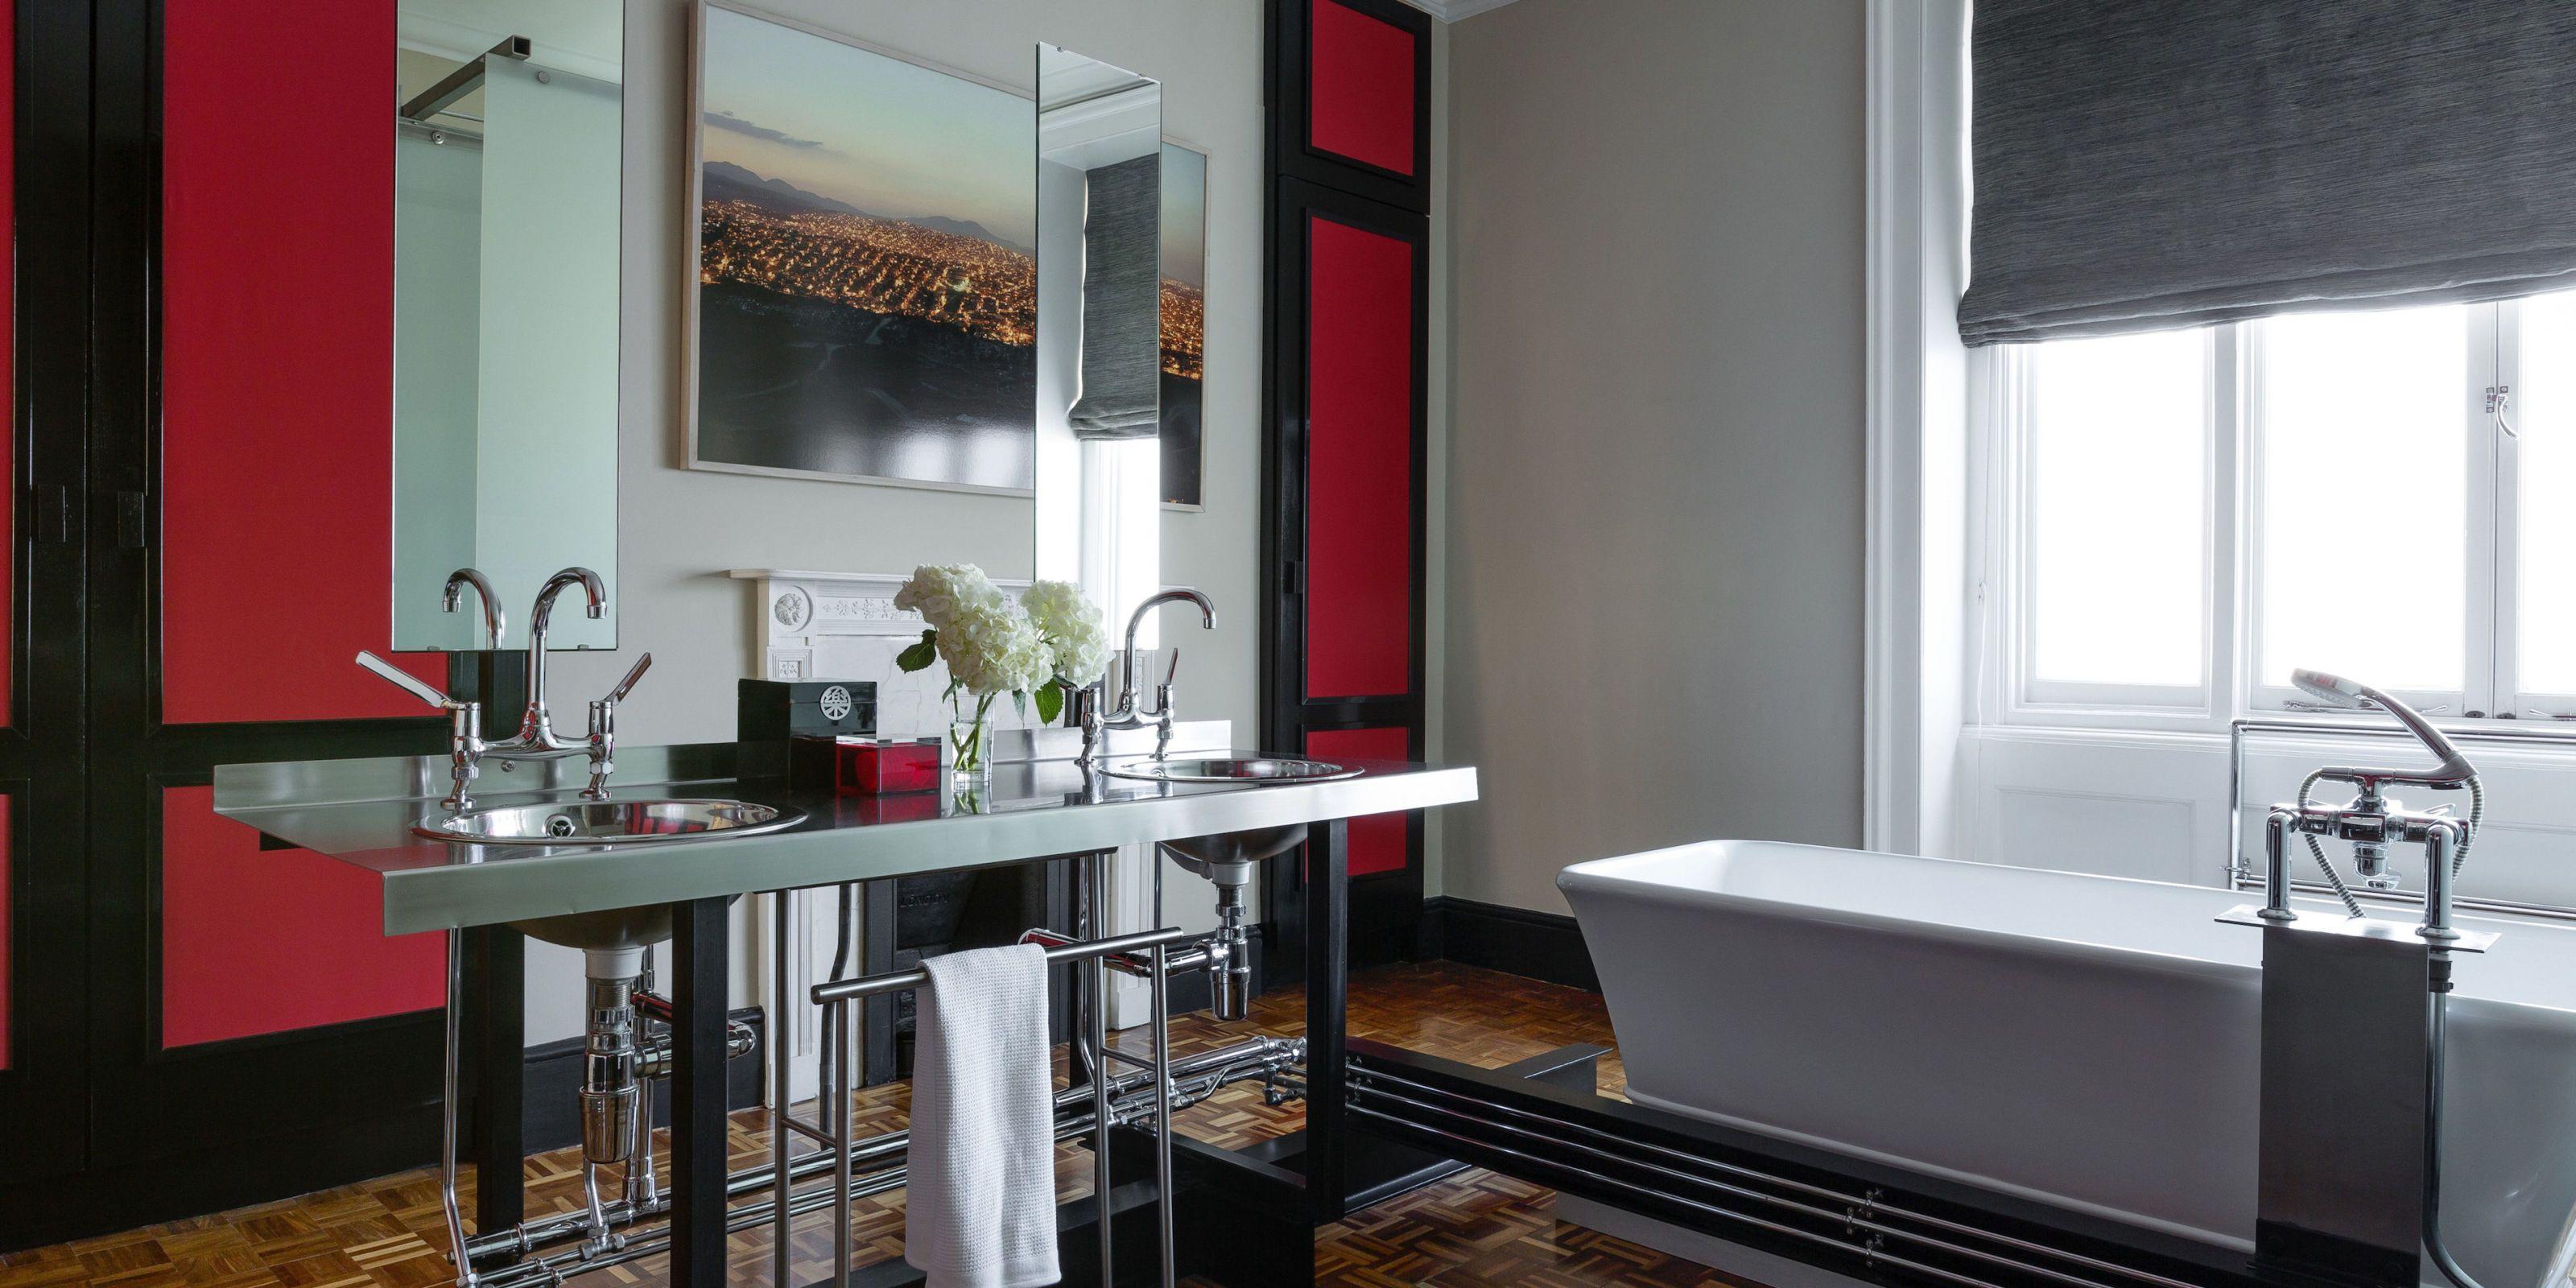 80 Best Bathroom Design Ideas Gallery Of Stylish Small